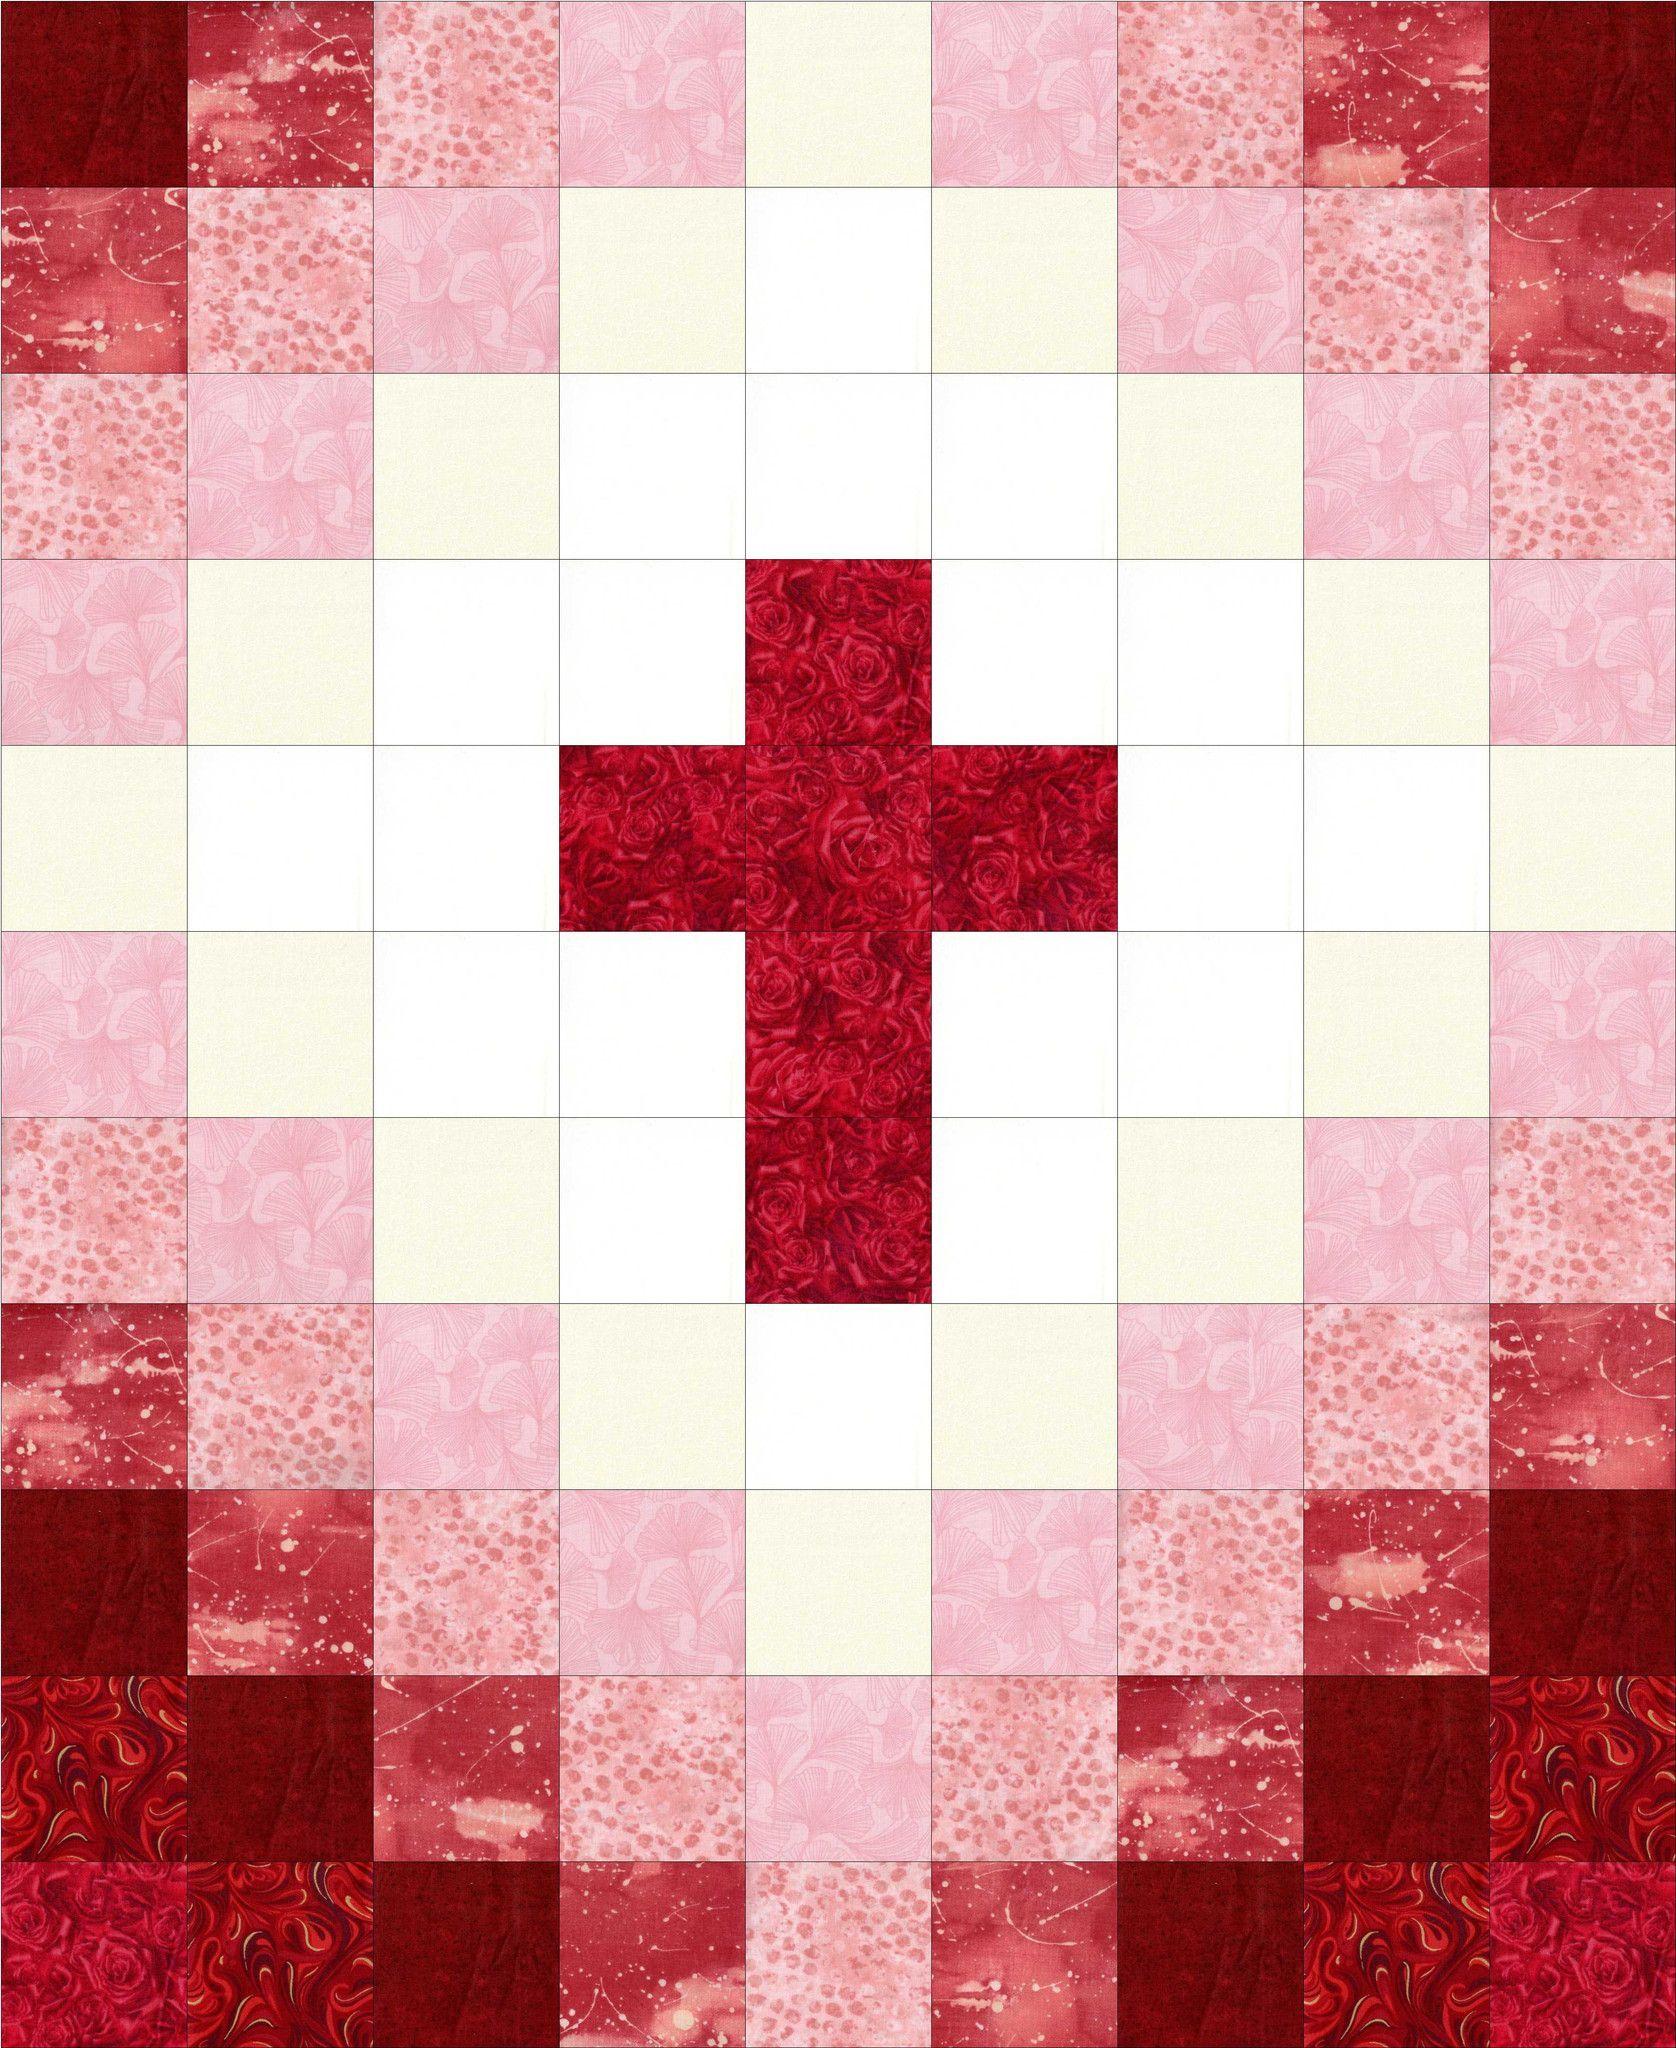 Cross Christian Red Pre-Cut Quilt Kit | Christian, Cross quilt and ... : pre cut quilt kits for beginners - Adamdwight.com